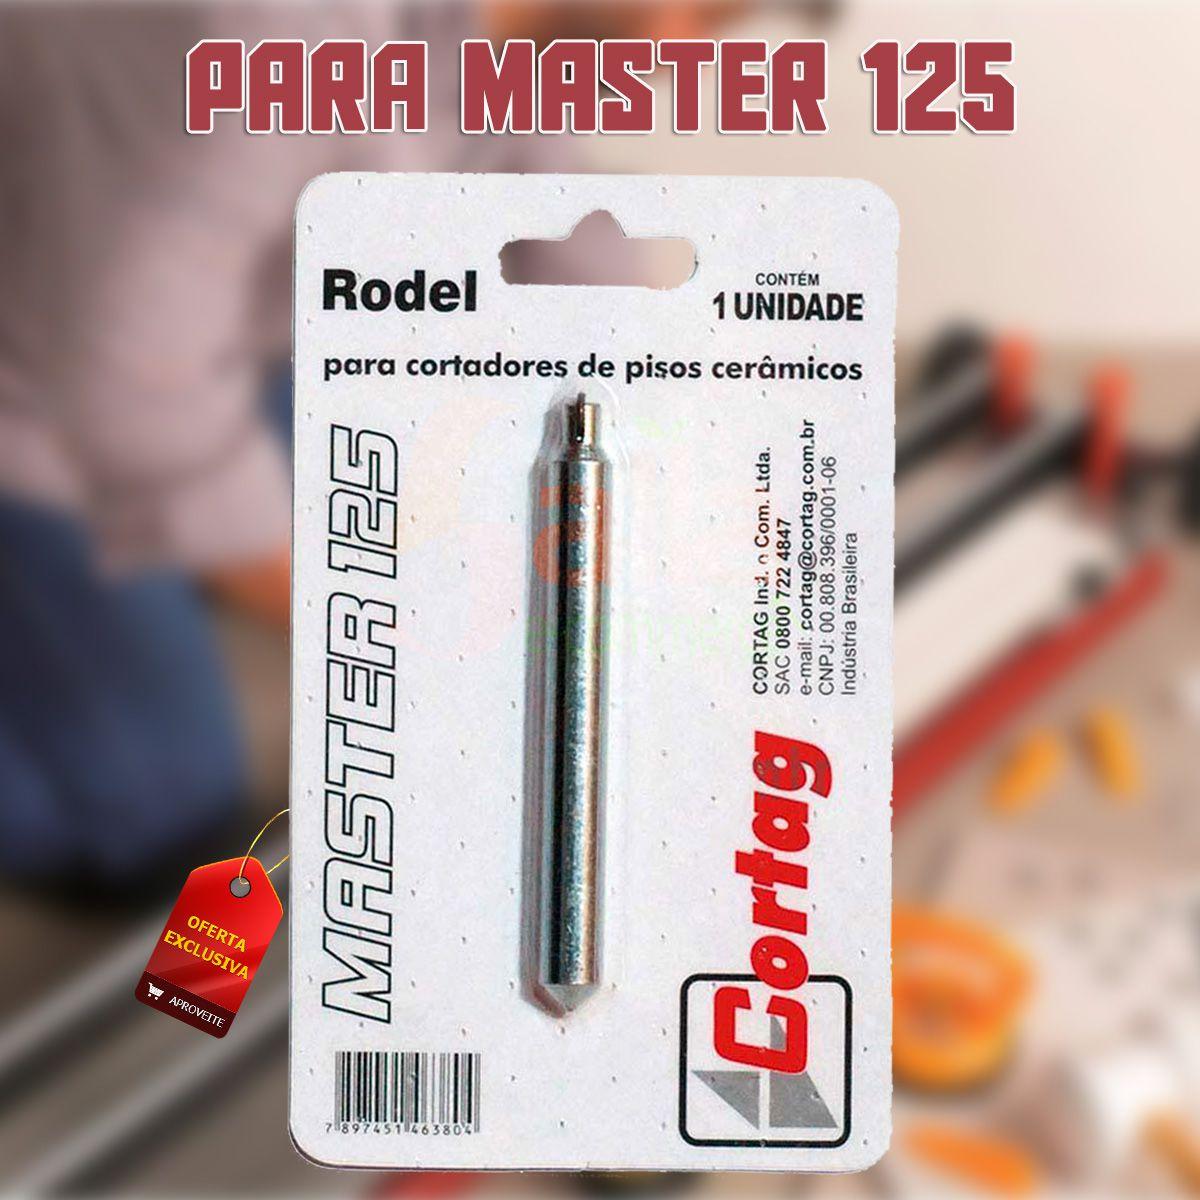 Rodel Master 125 Cortag